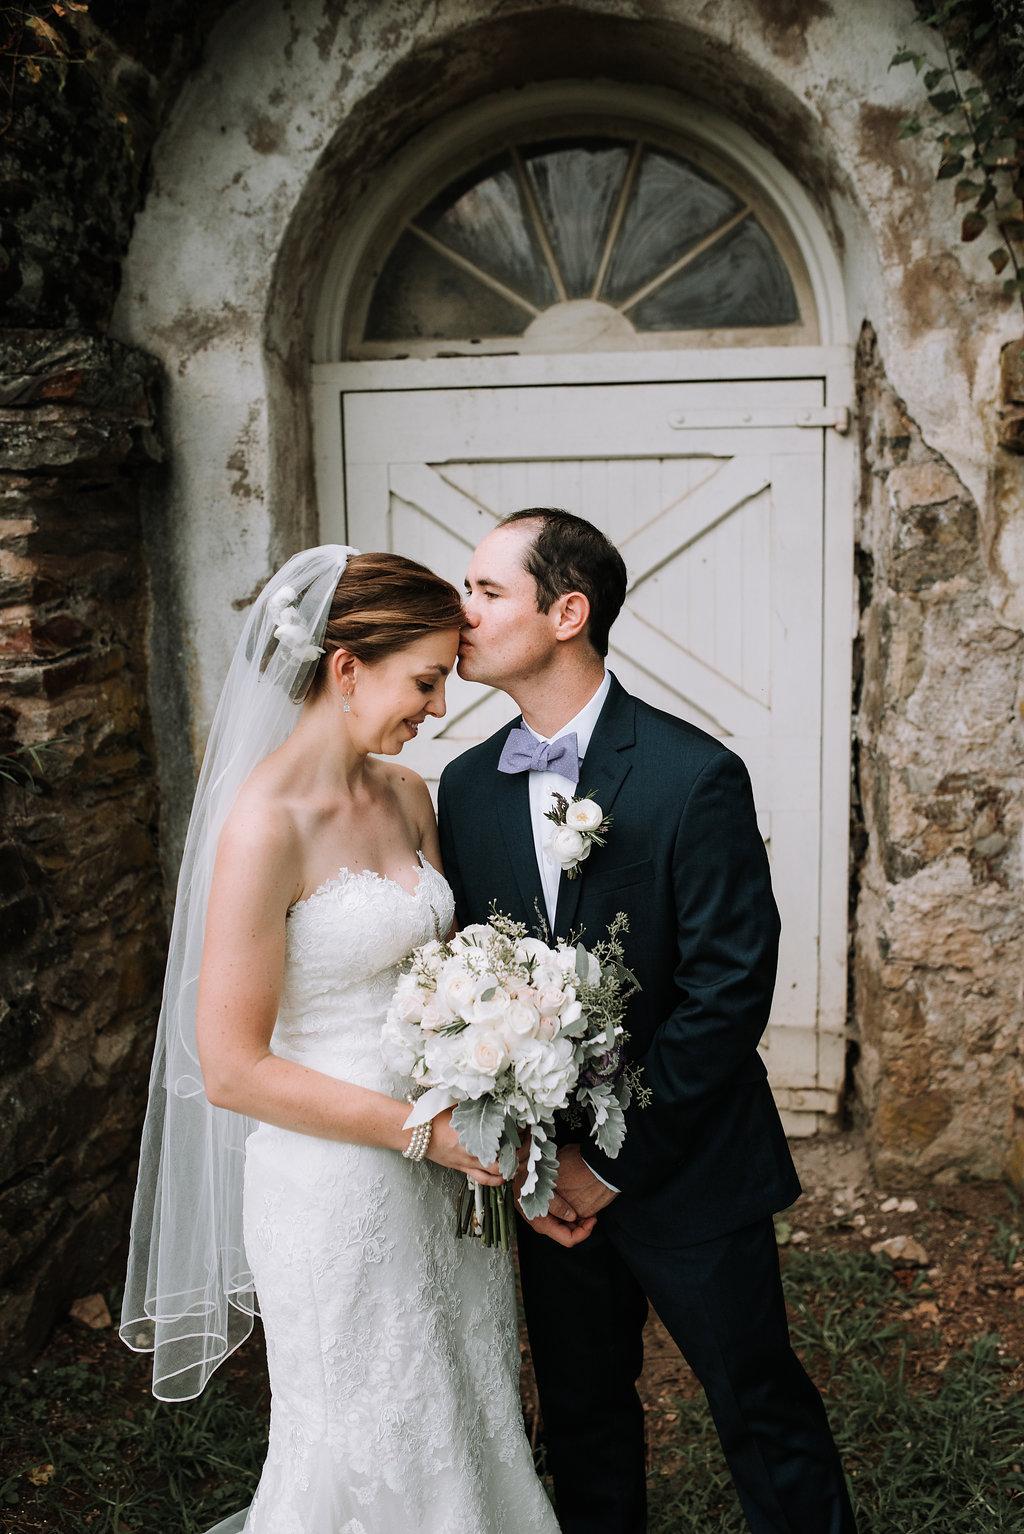 LUVLENS_WEDDING_ALYSSAPAUL-231.jpg